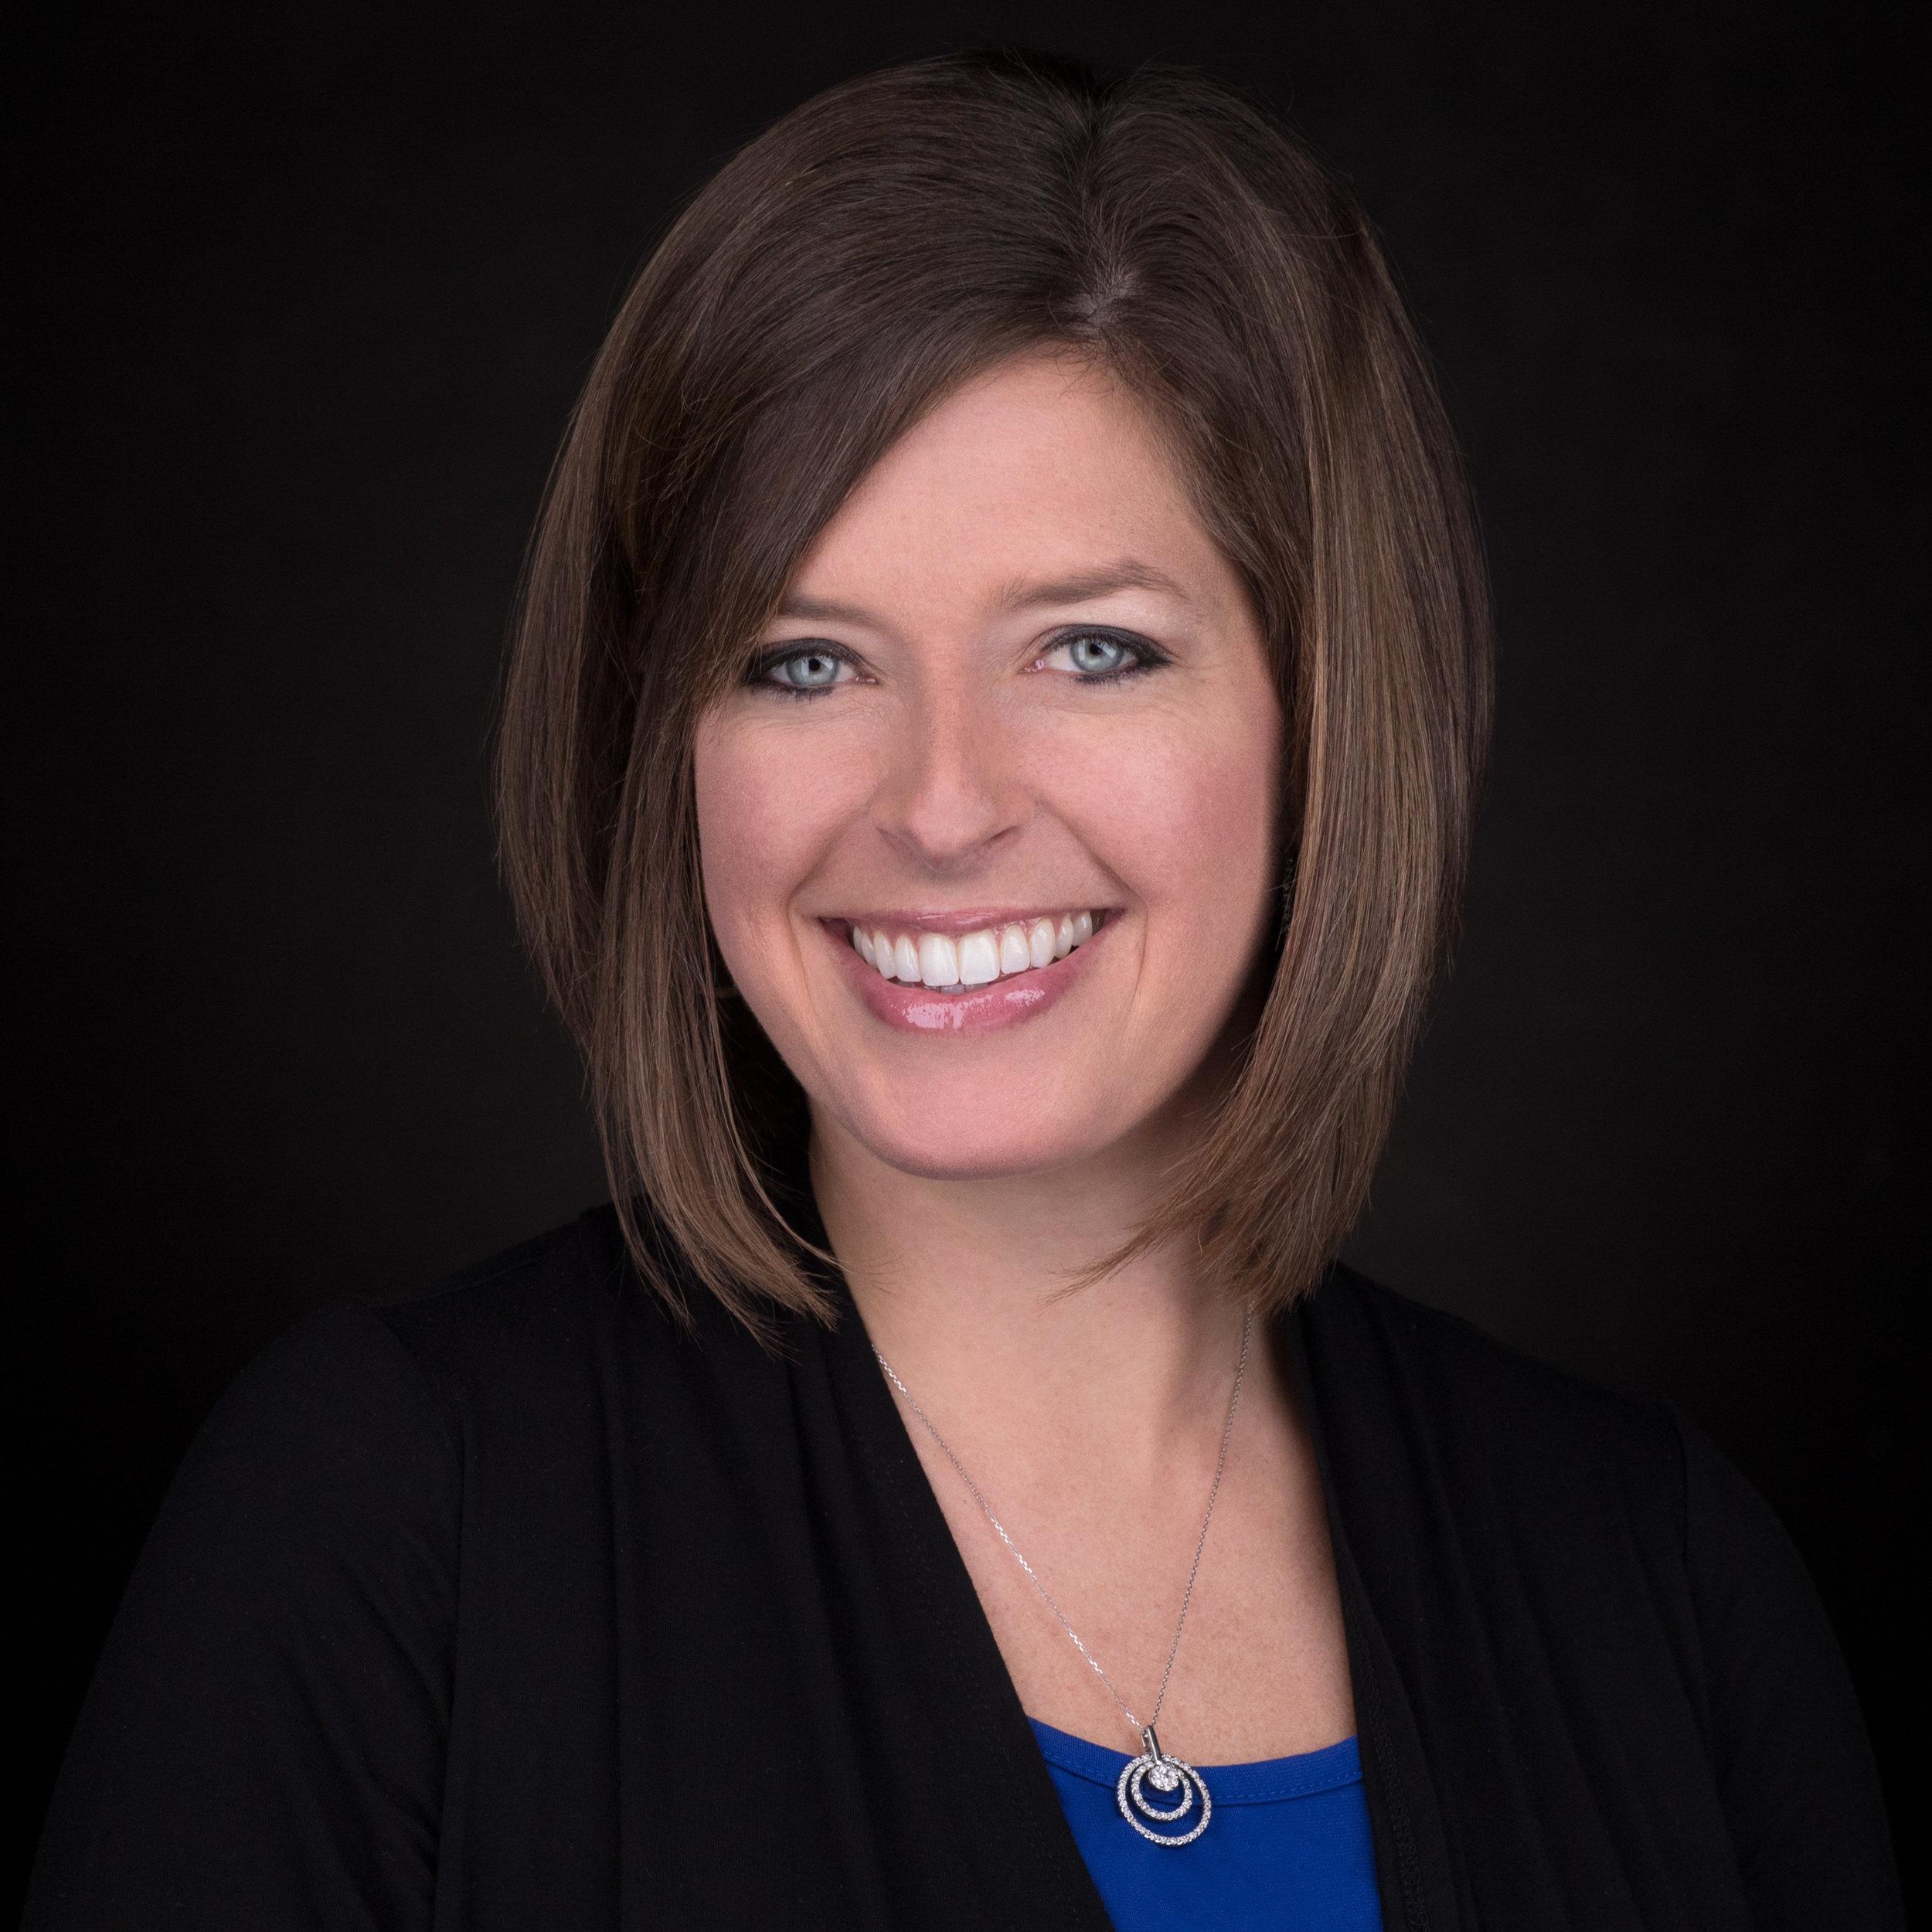 Rochelle Metz